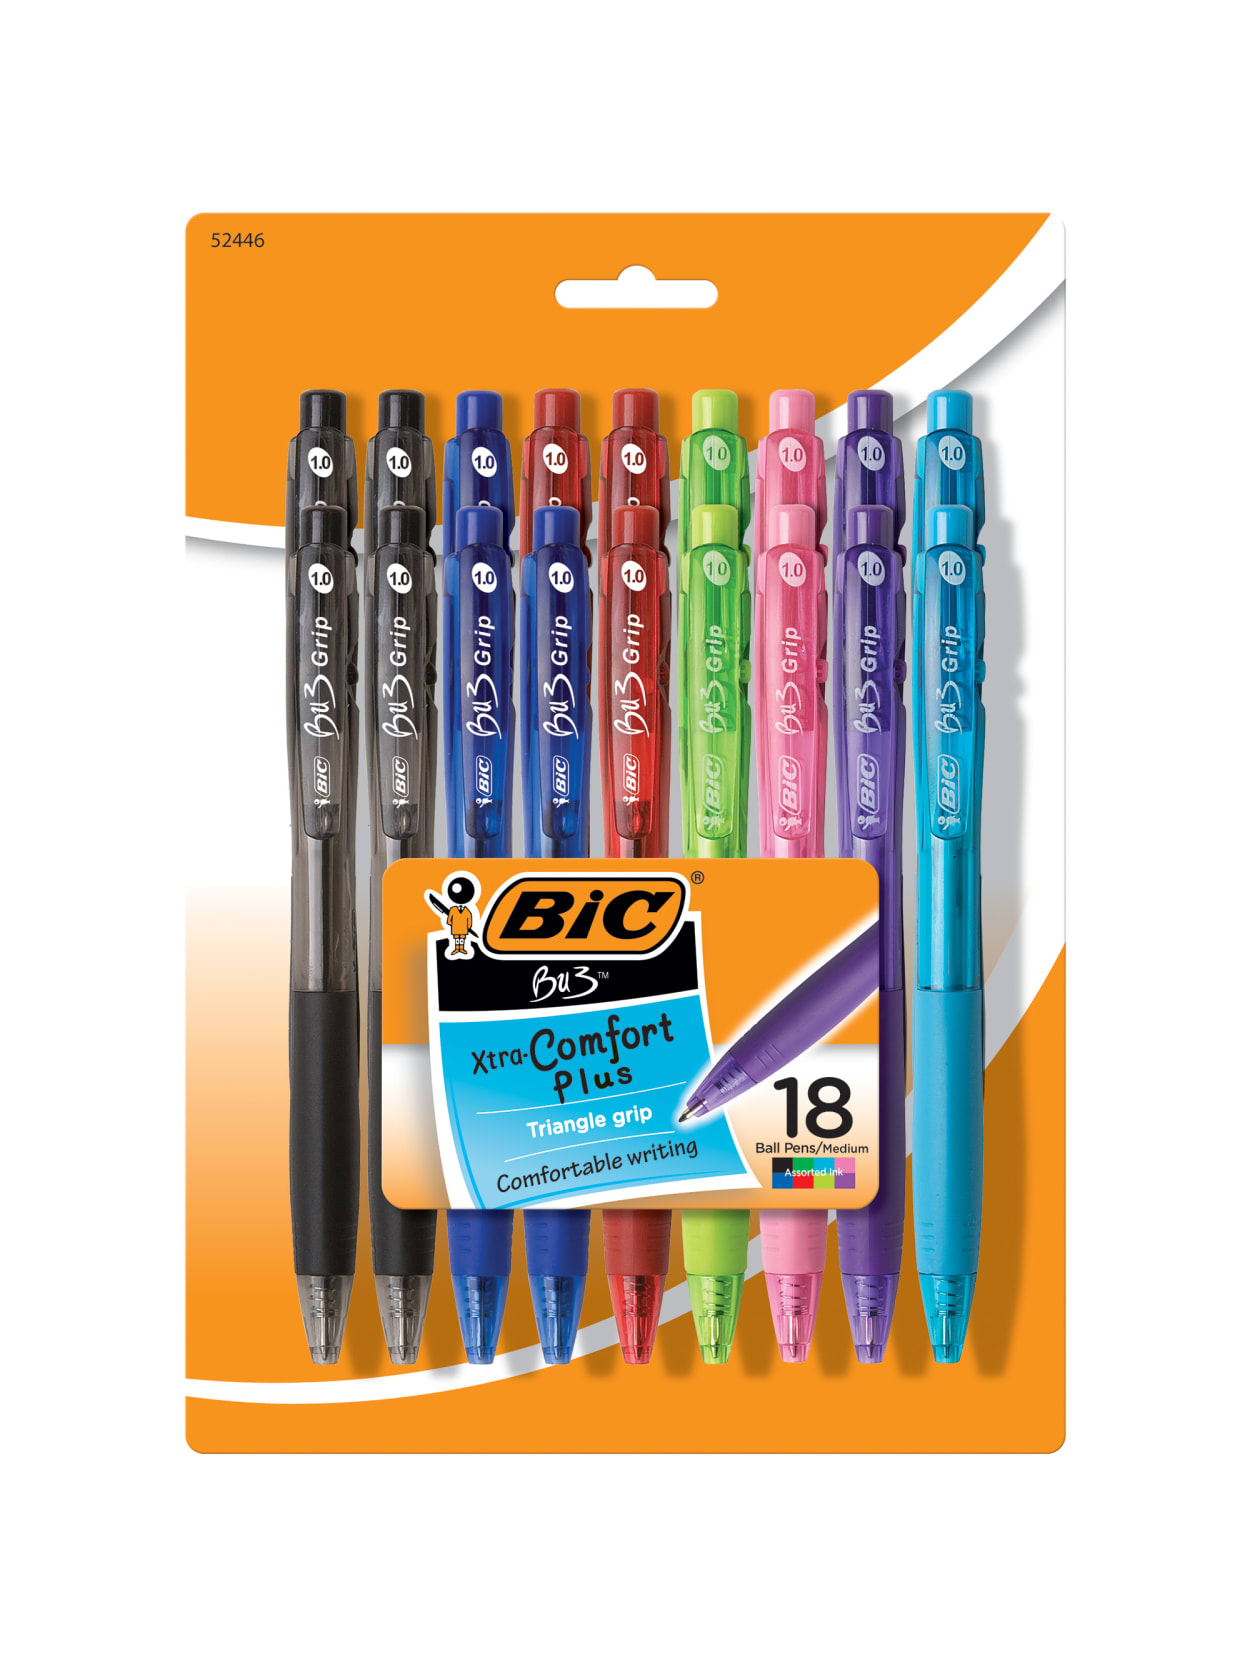 BIC BU3 Retractable Ball Pen Fashion 18 Pk WX7ST272-AST